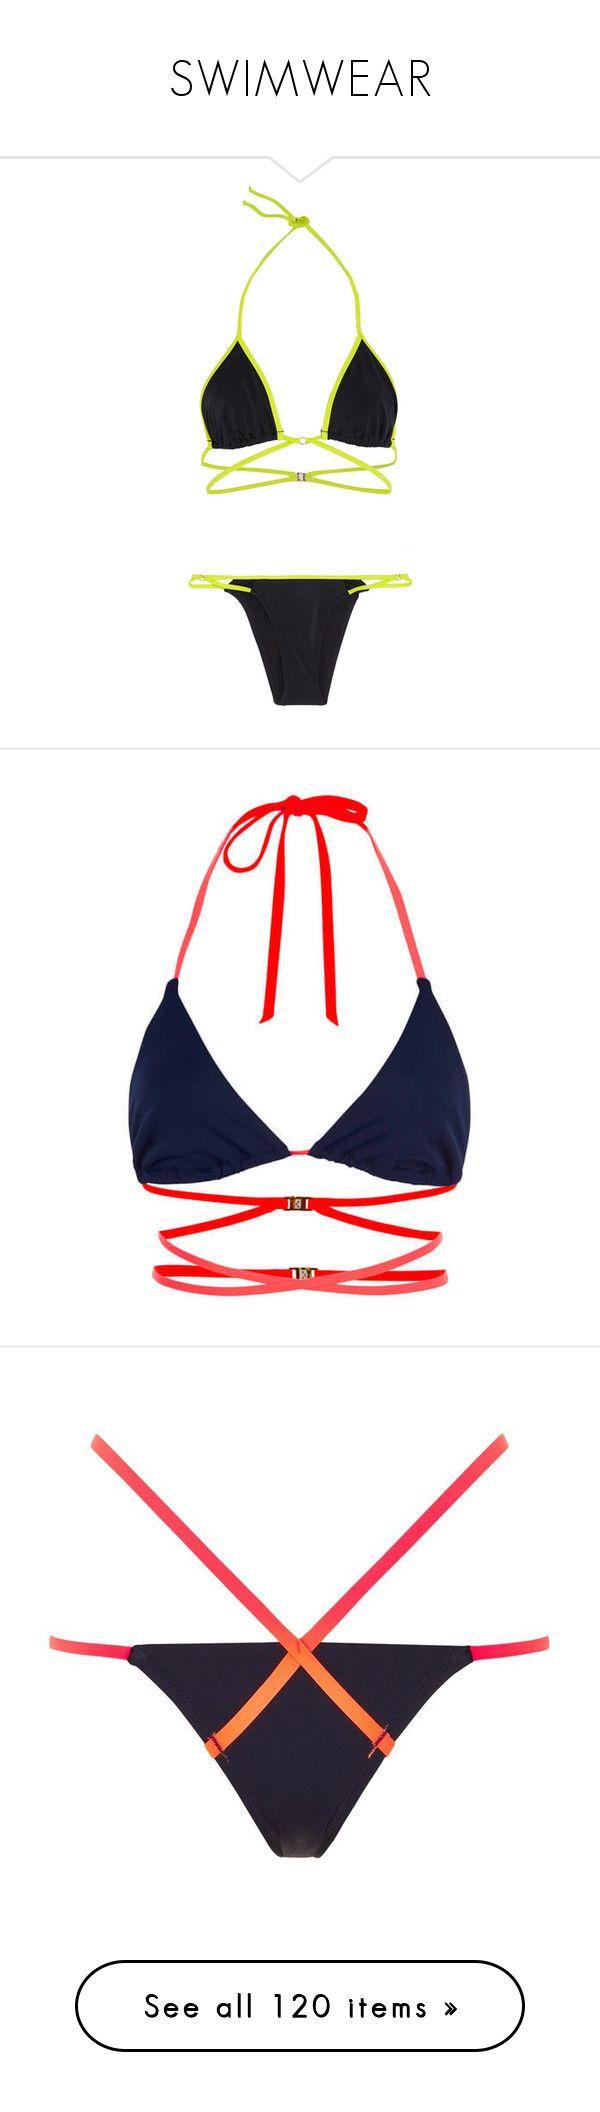 """SWIMWEAR"" by aitanas-closet ❤ liked on Polyvore featuring swimwear, bikinis, bikini, cutout swimwear, triangle swimwear, gold triangle bikini, triangle bikinis, gold bikini, bikini tops and tops"